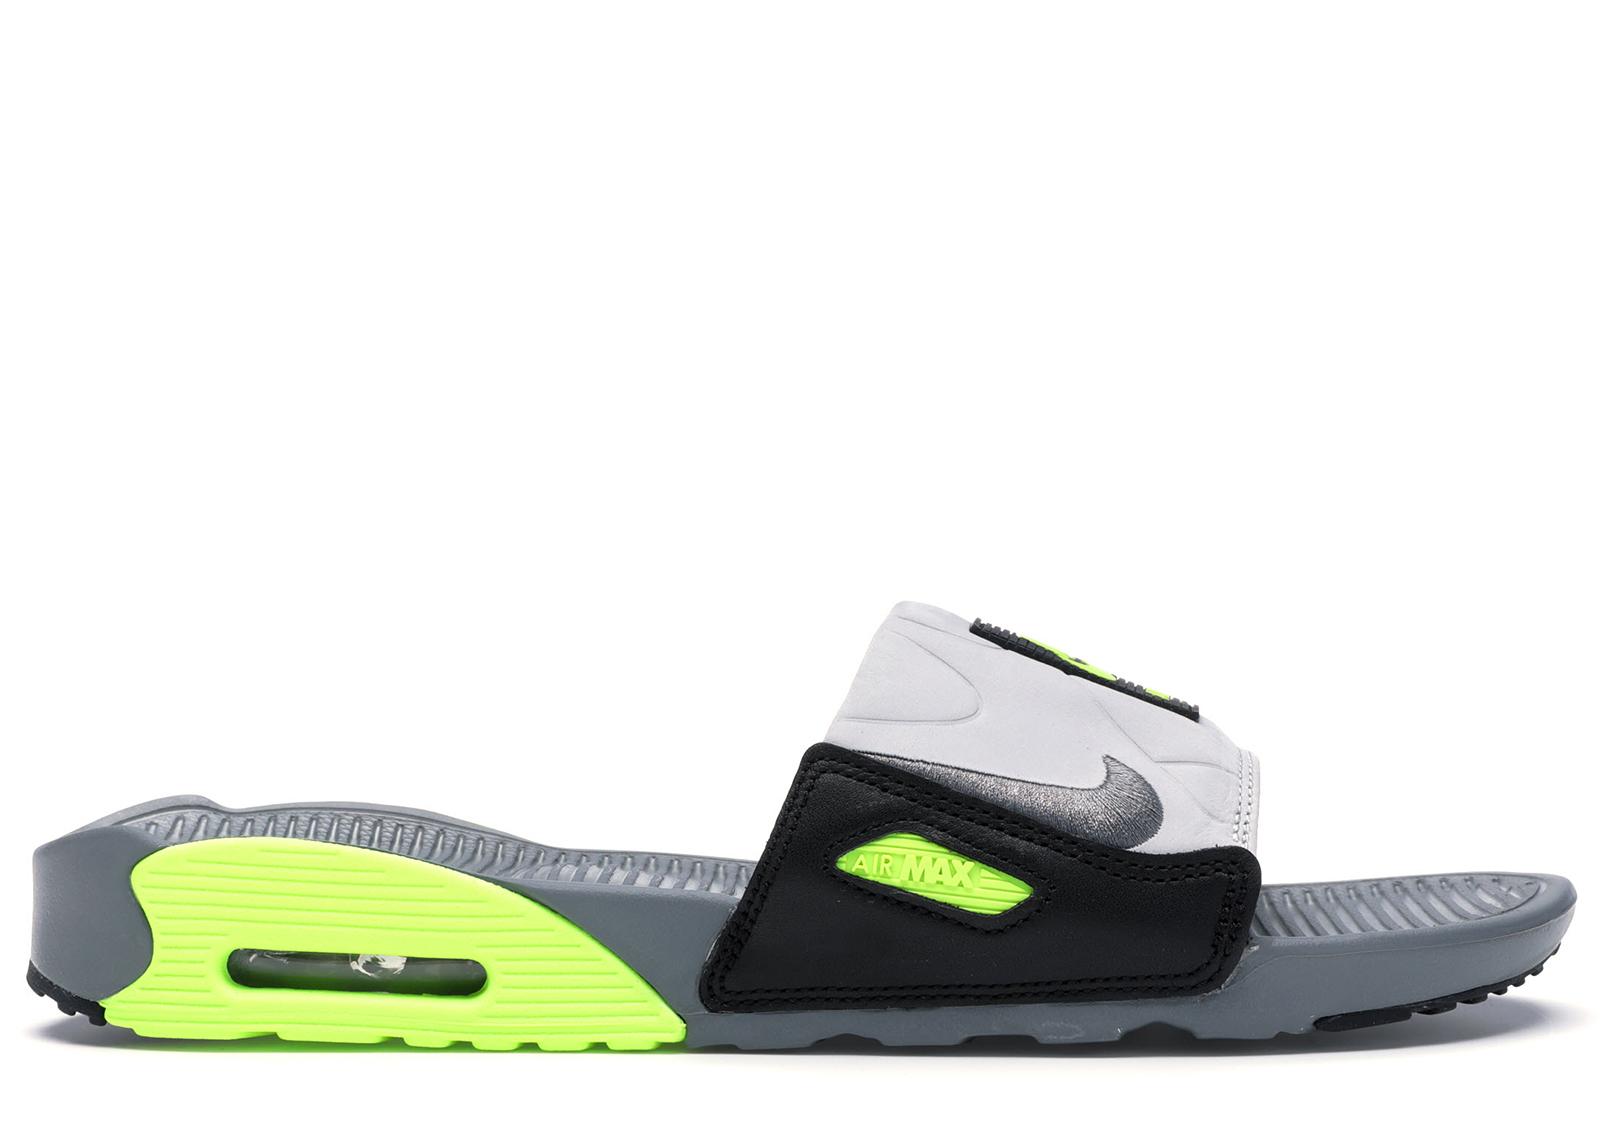 Nike Air Max 90 Slide Smoke Grey Volt Black - BQ4635-001